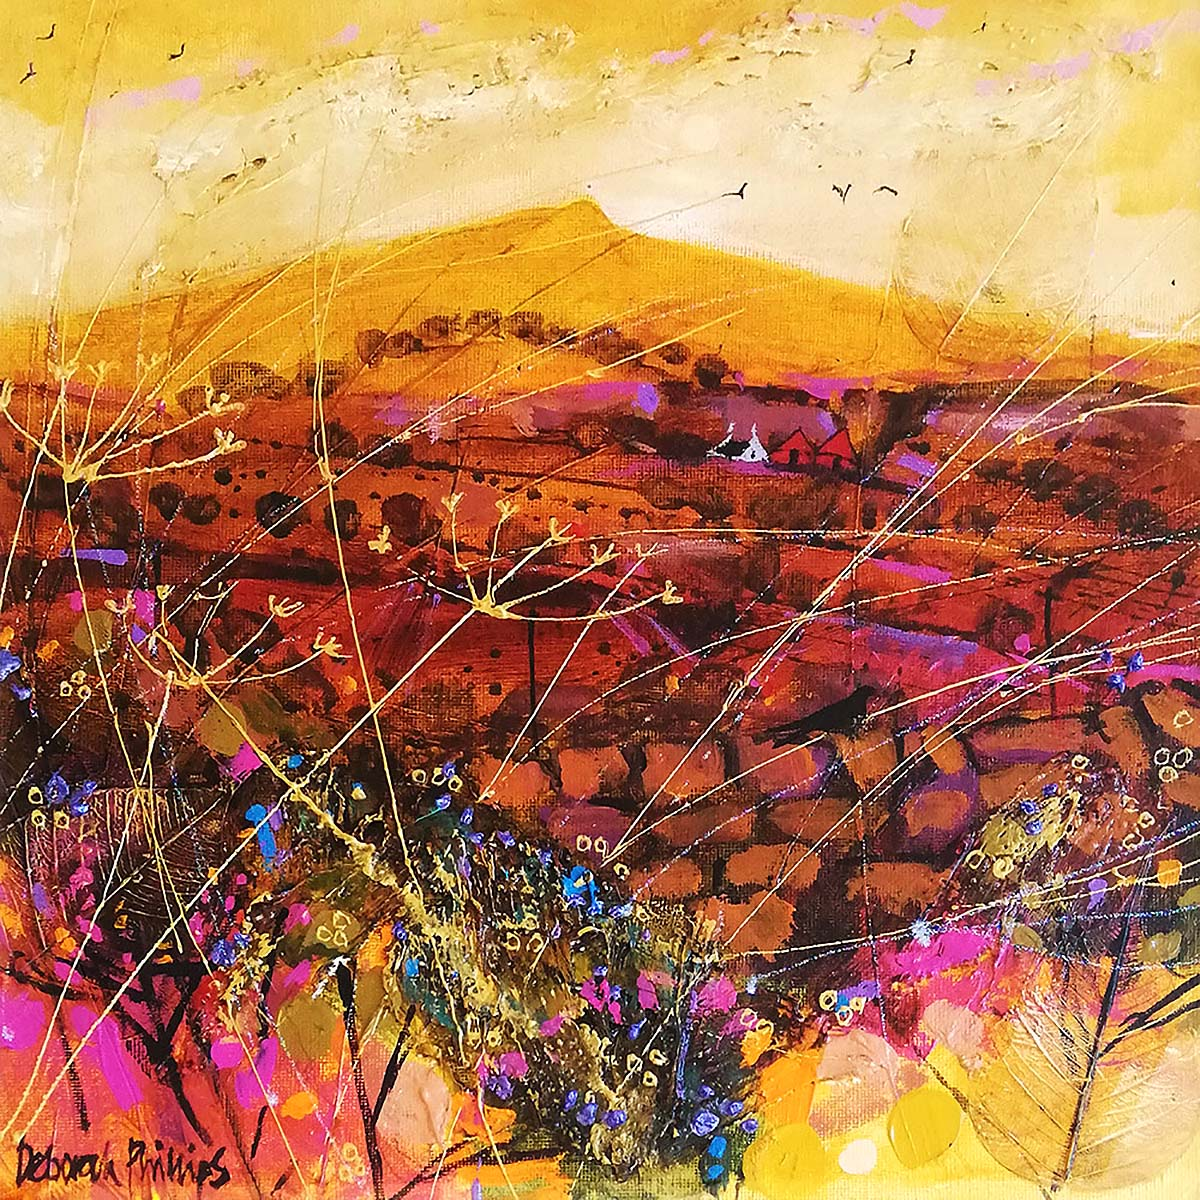 Deborah Phillips, 'Arid Evening', acrylic